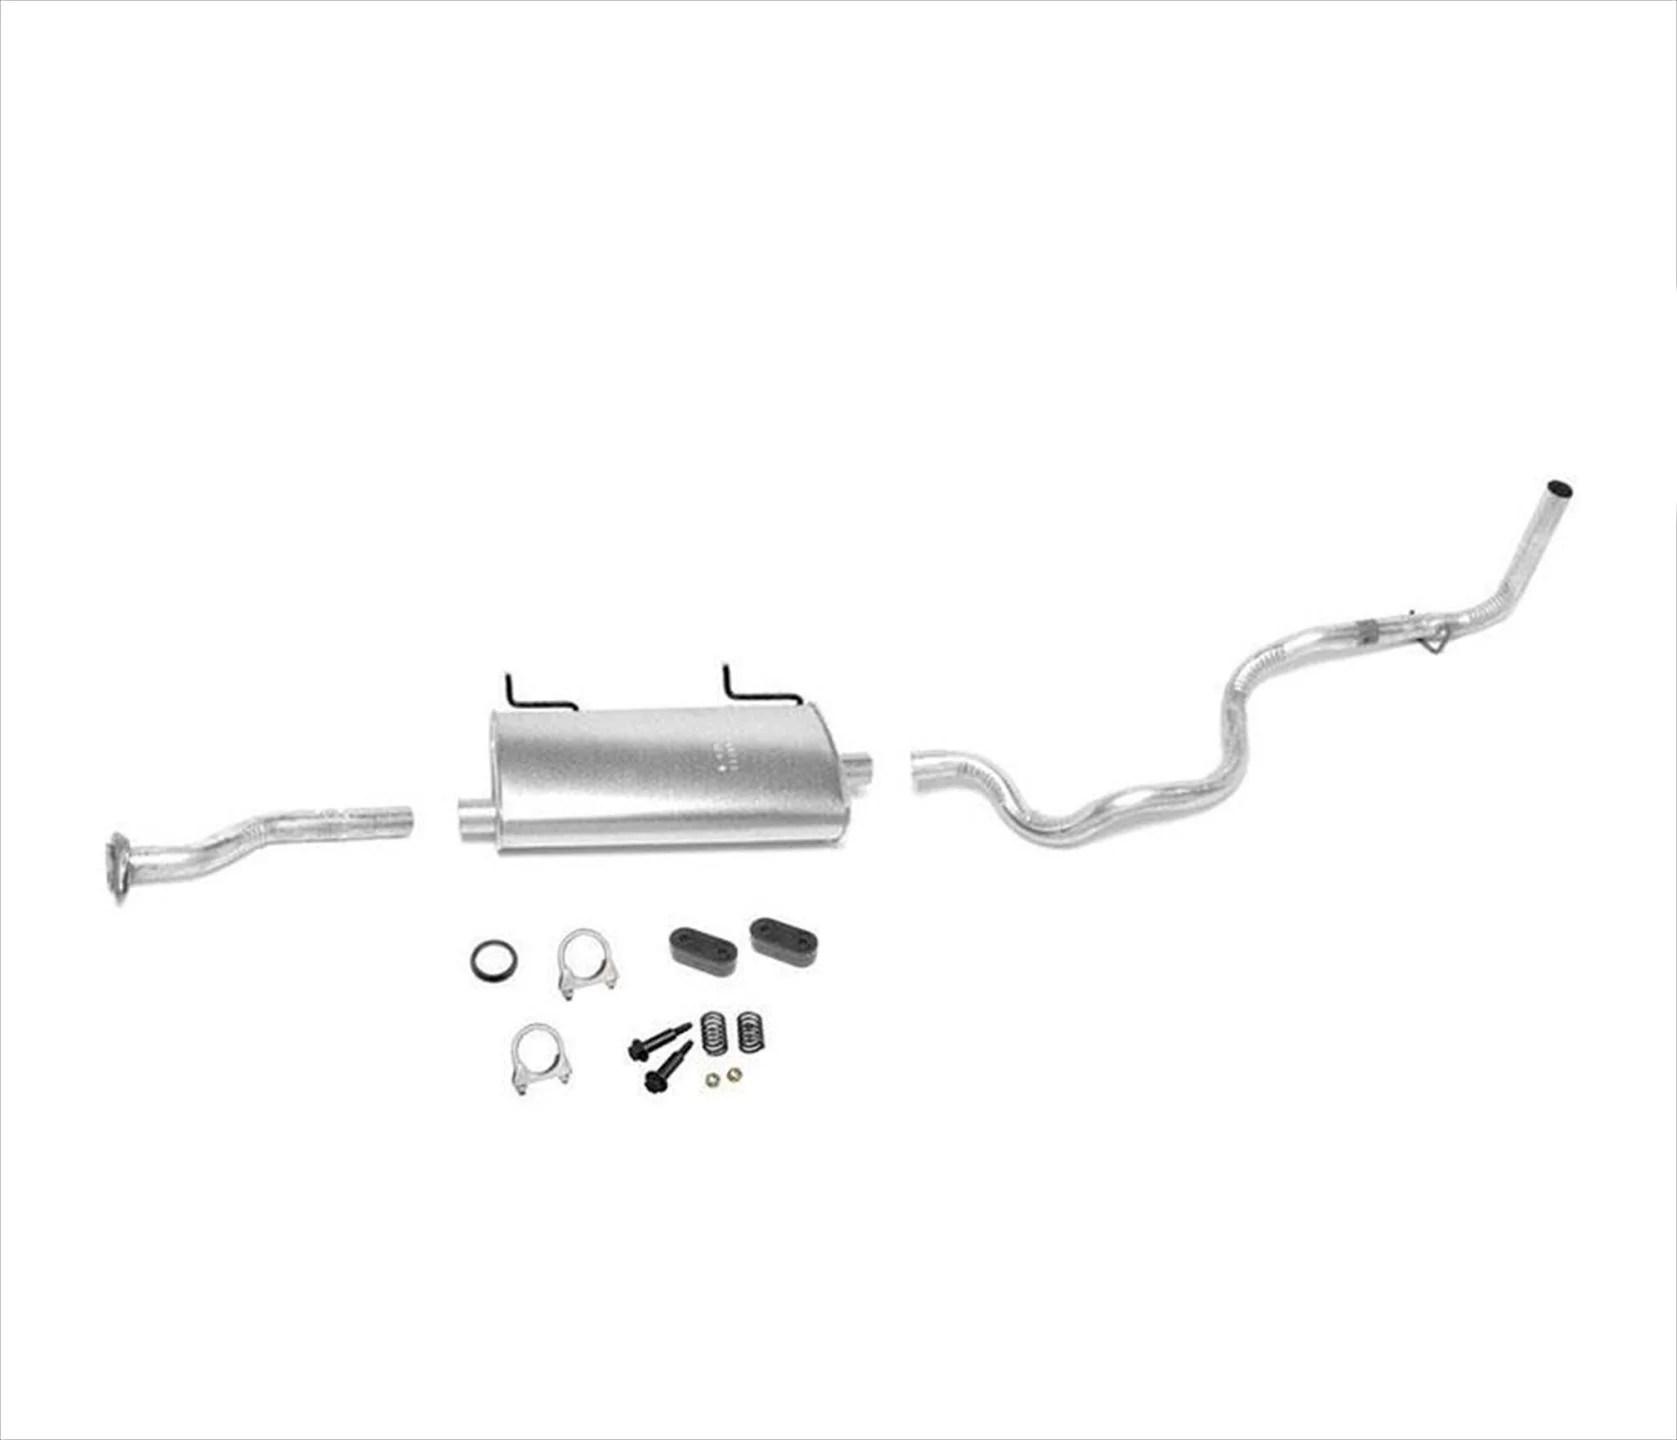 95 97 ranger b2300 with 114 inch w b 2 3l 3 0l 4 0l muffler exhaust pipe system walmart com